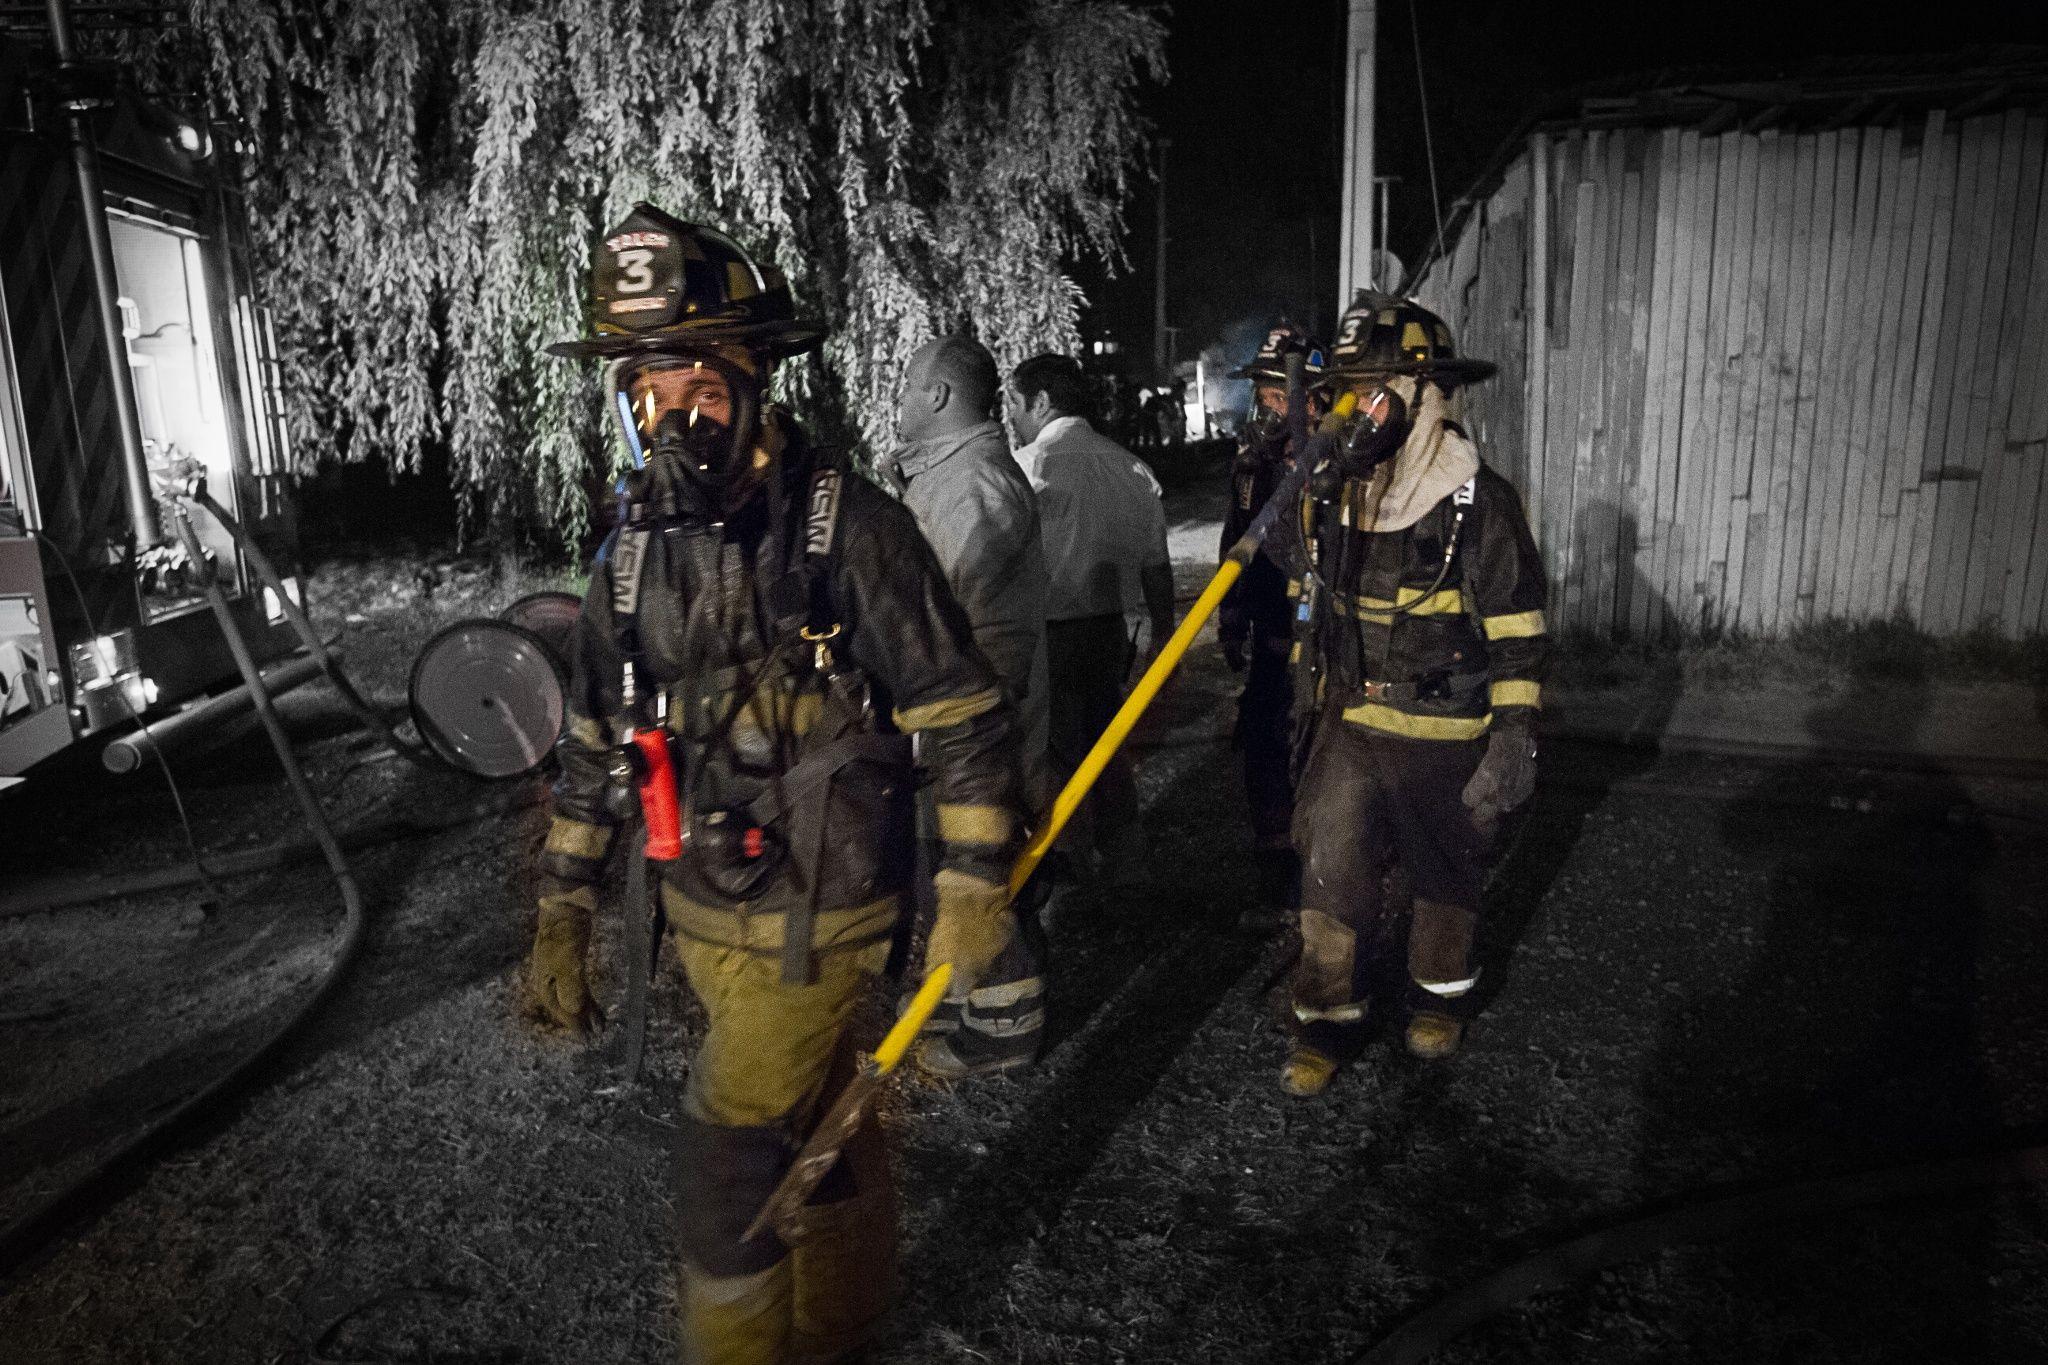 Photograph Firefighter by Juan Pablo Muñoz Diaz on 500px